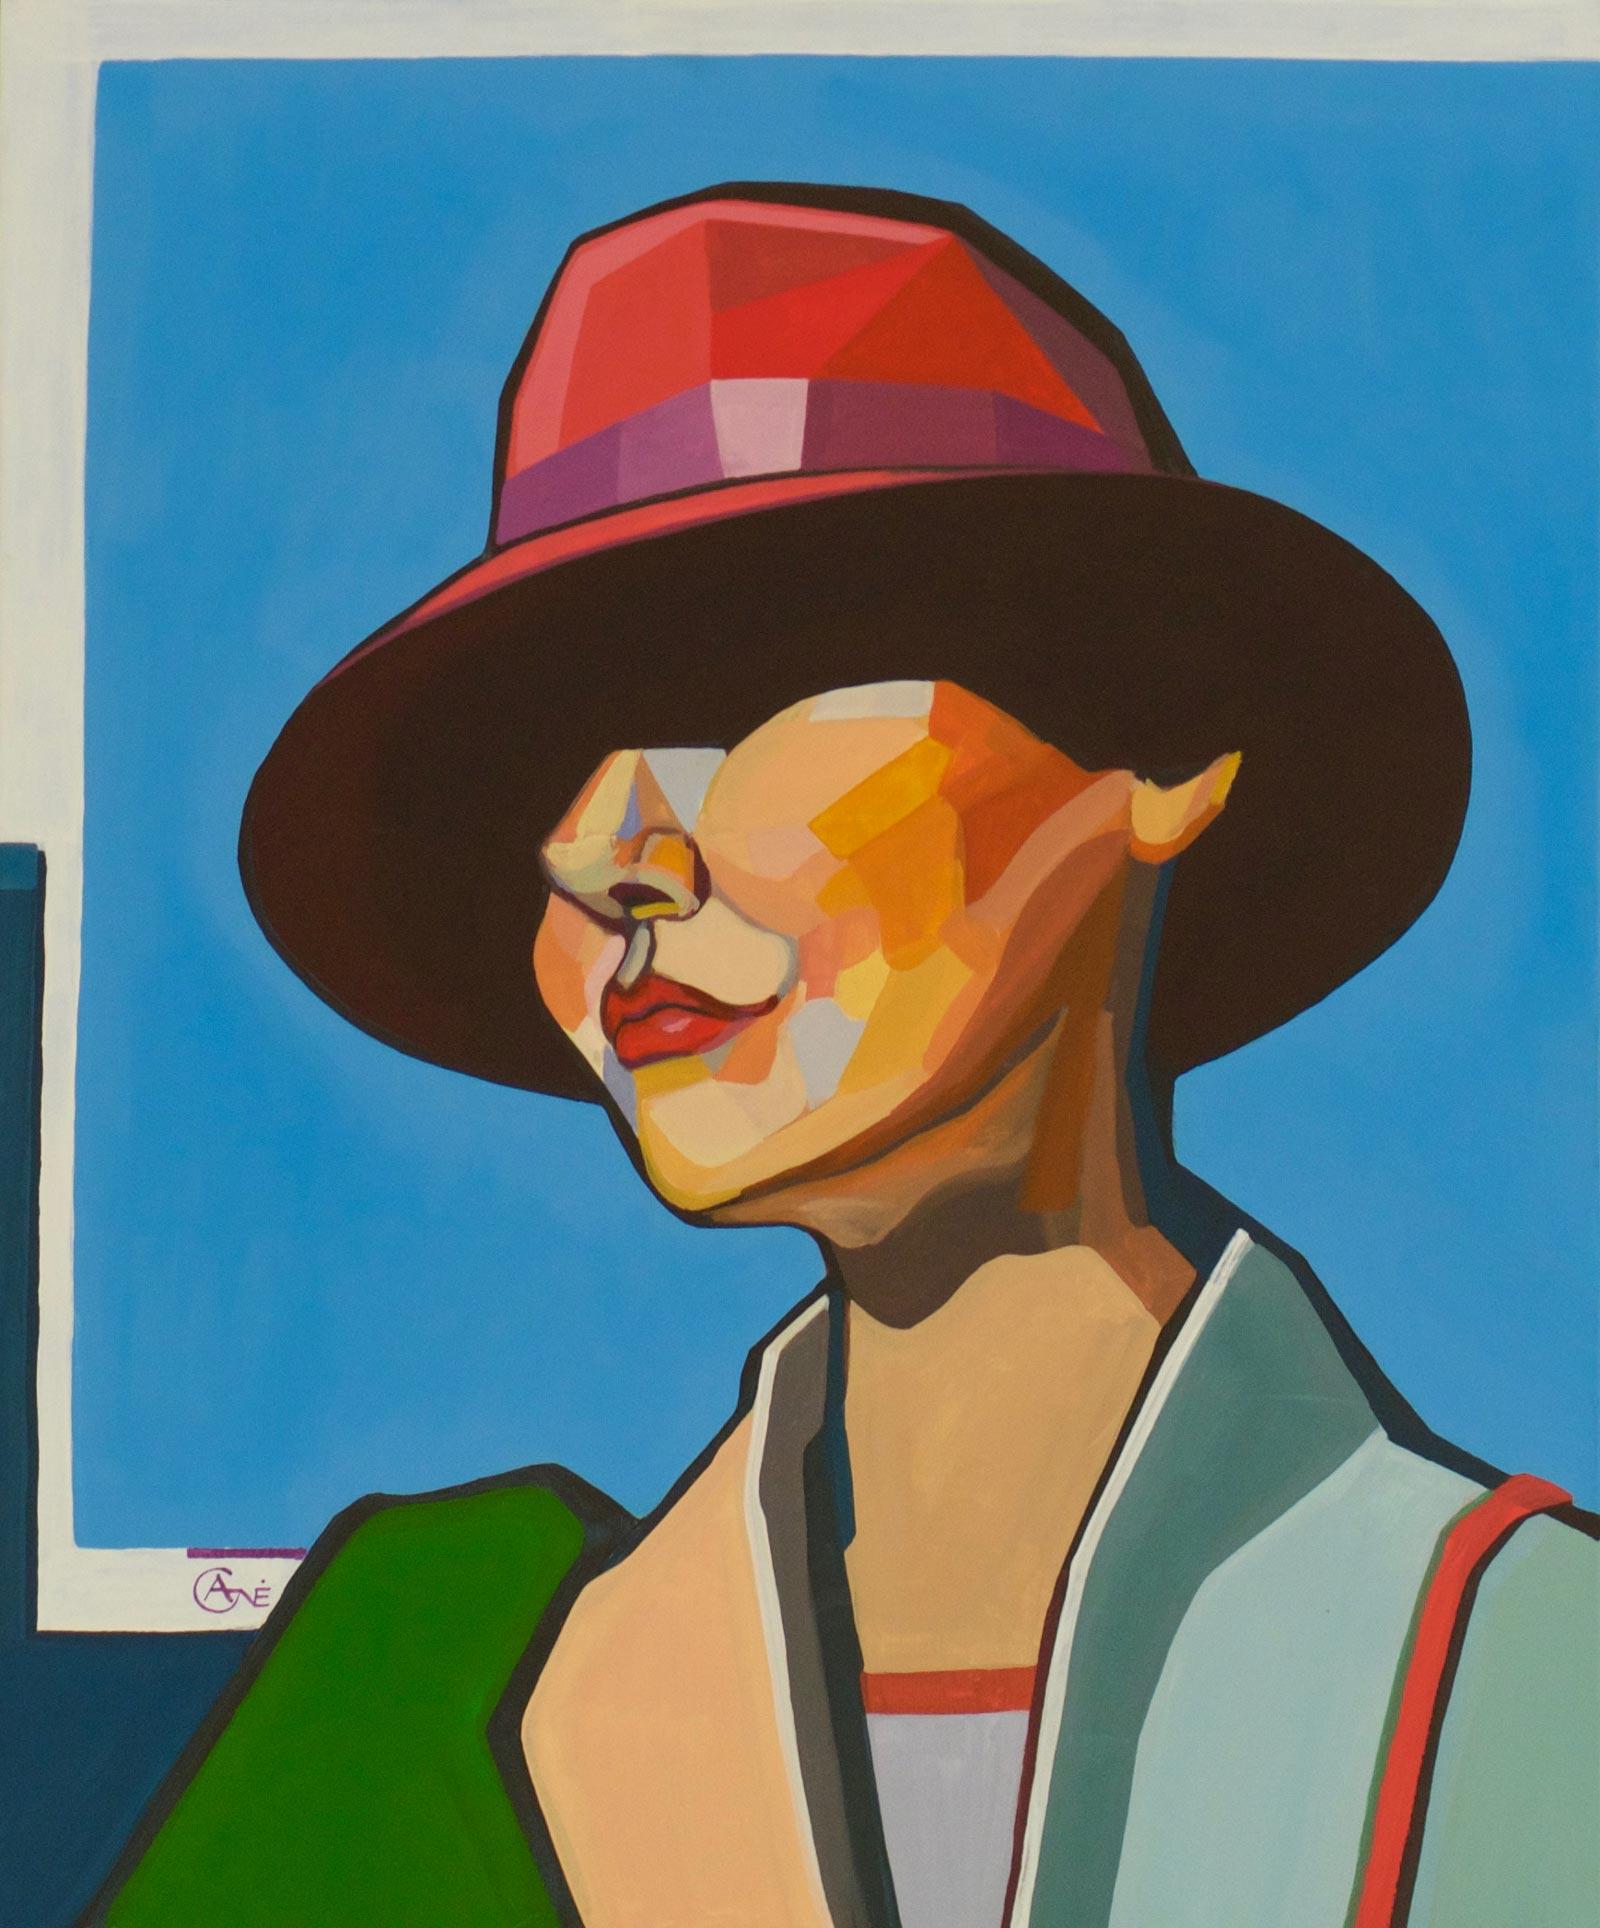 Modern acrylic painting 'Squinch'. Artist Agne Kisonaite